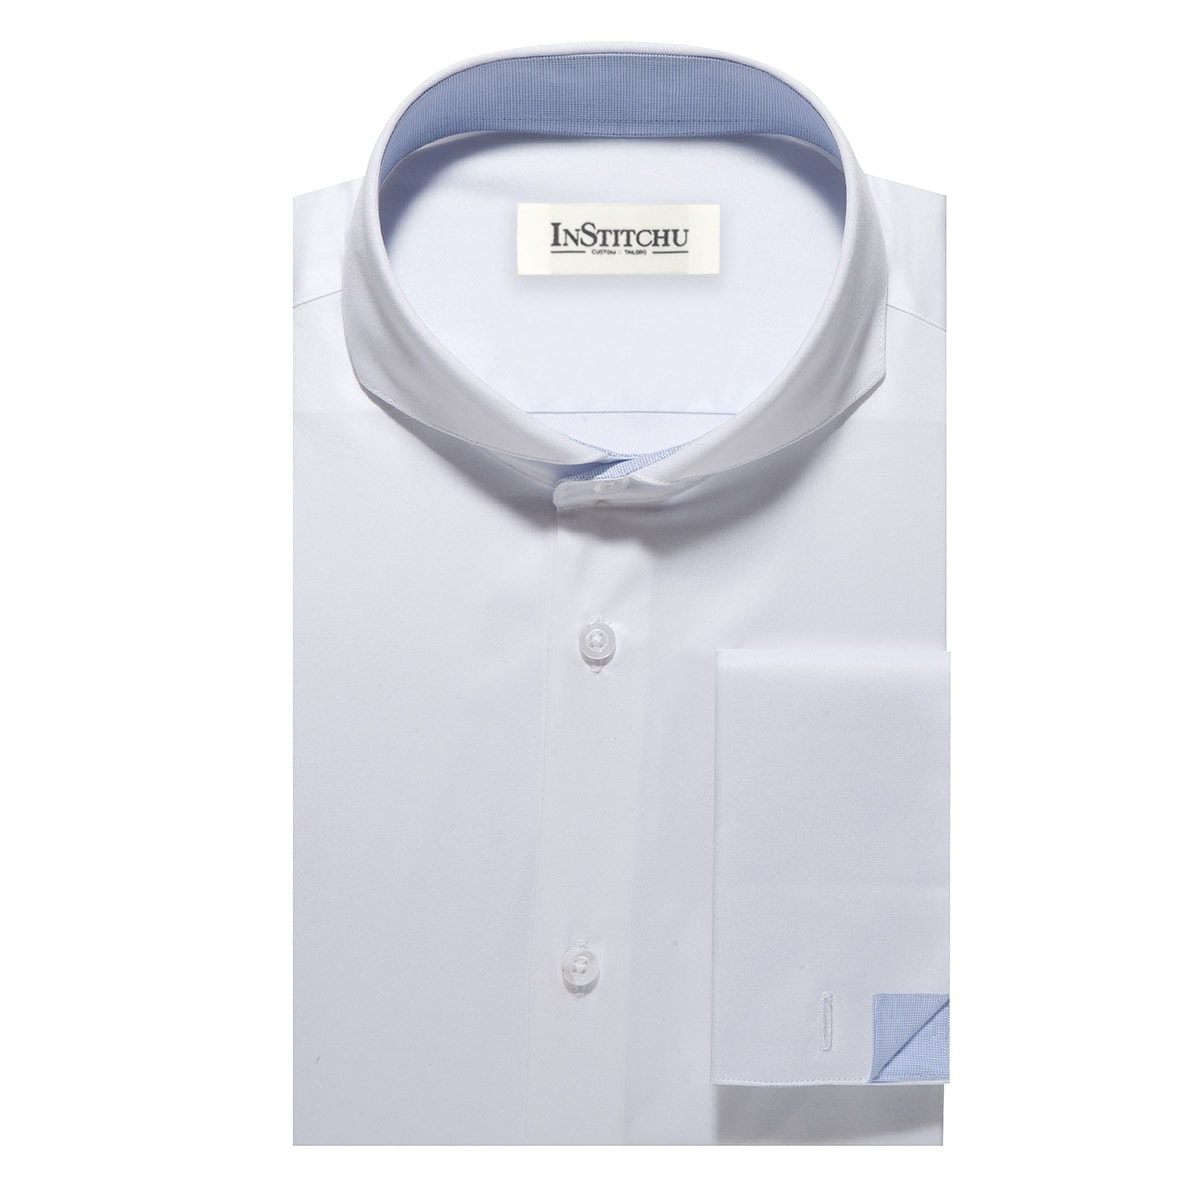 InStitchu Collection The Vanderbilt White Shirt